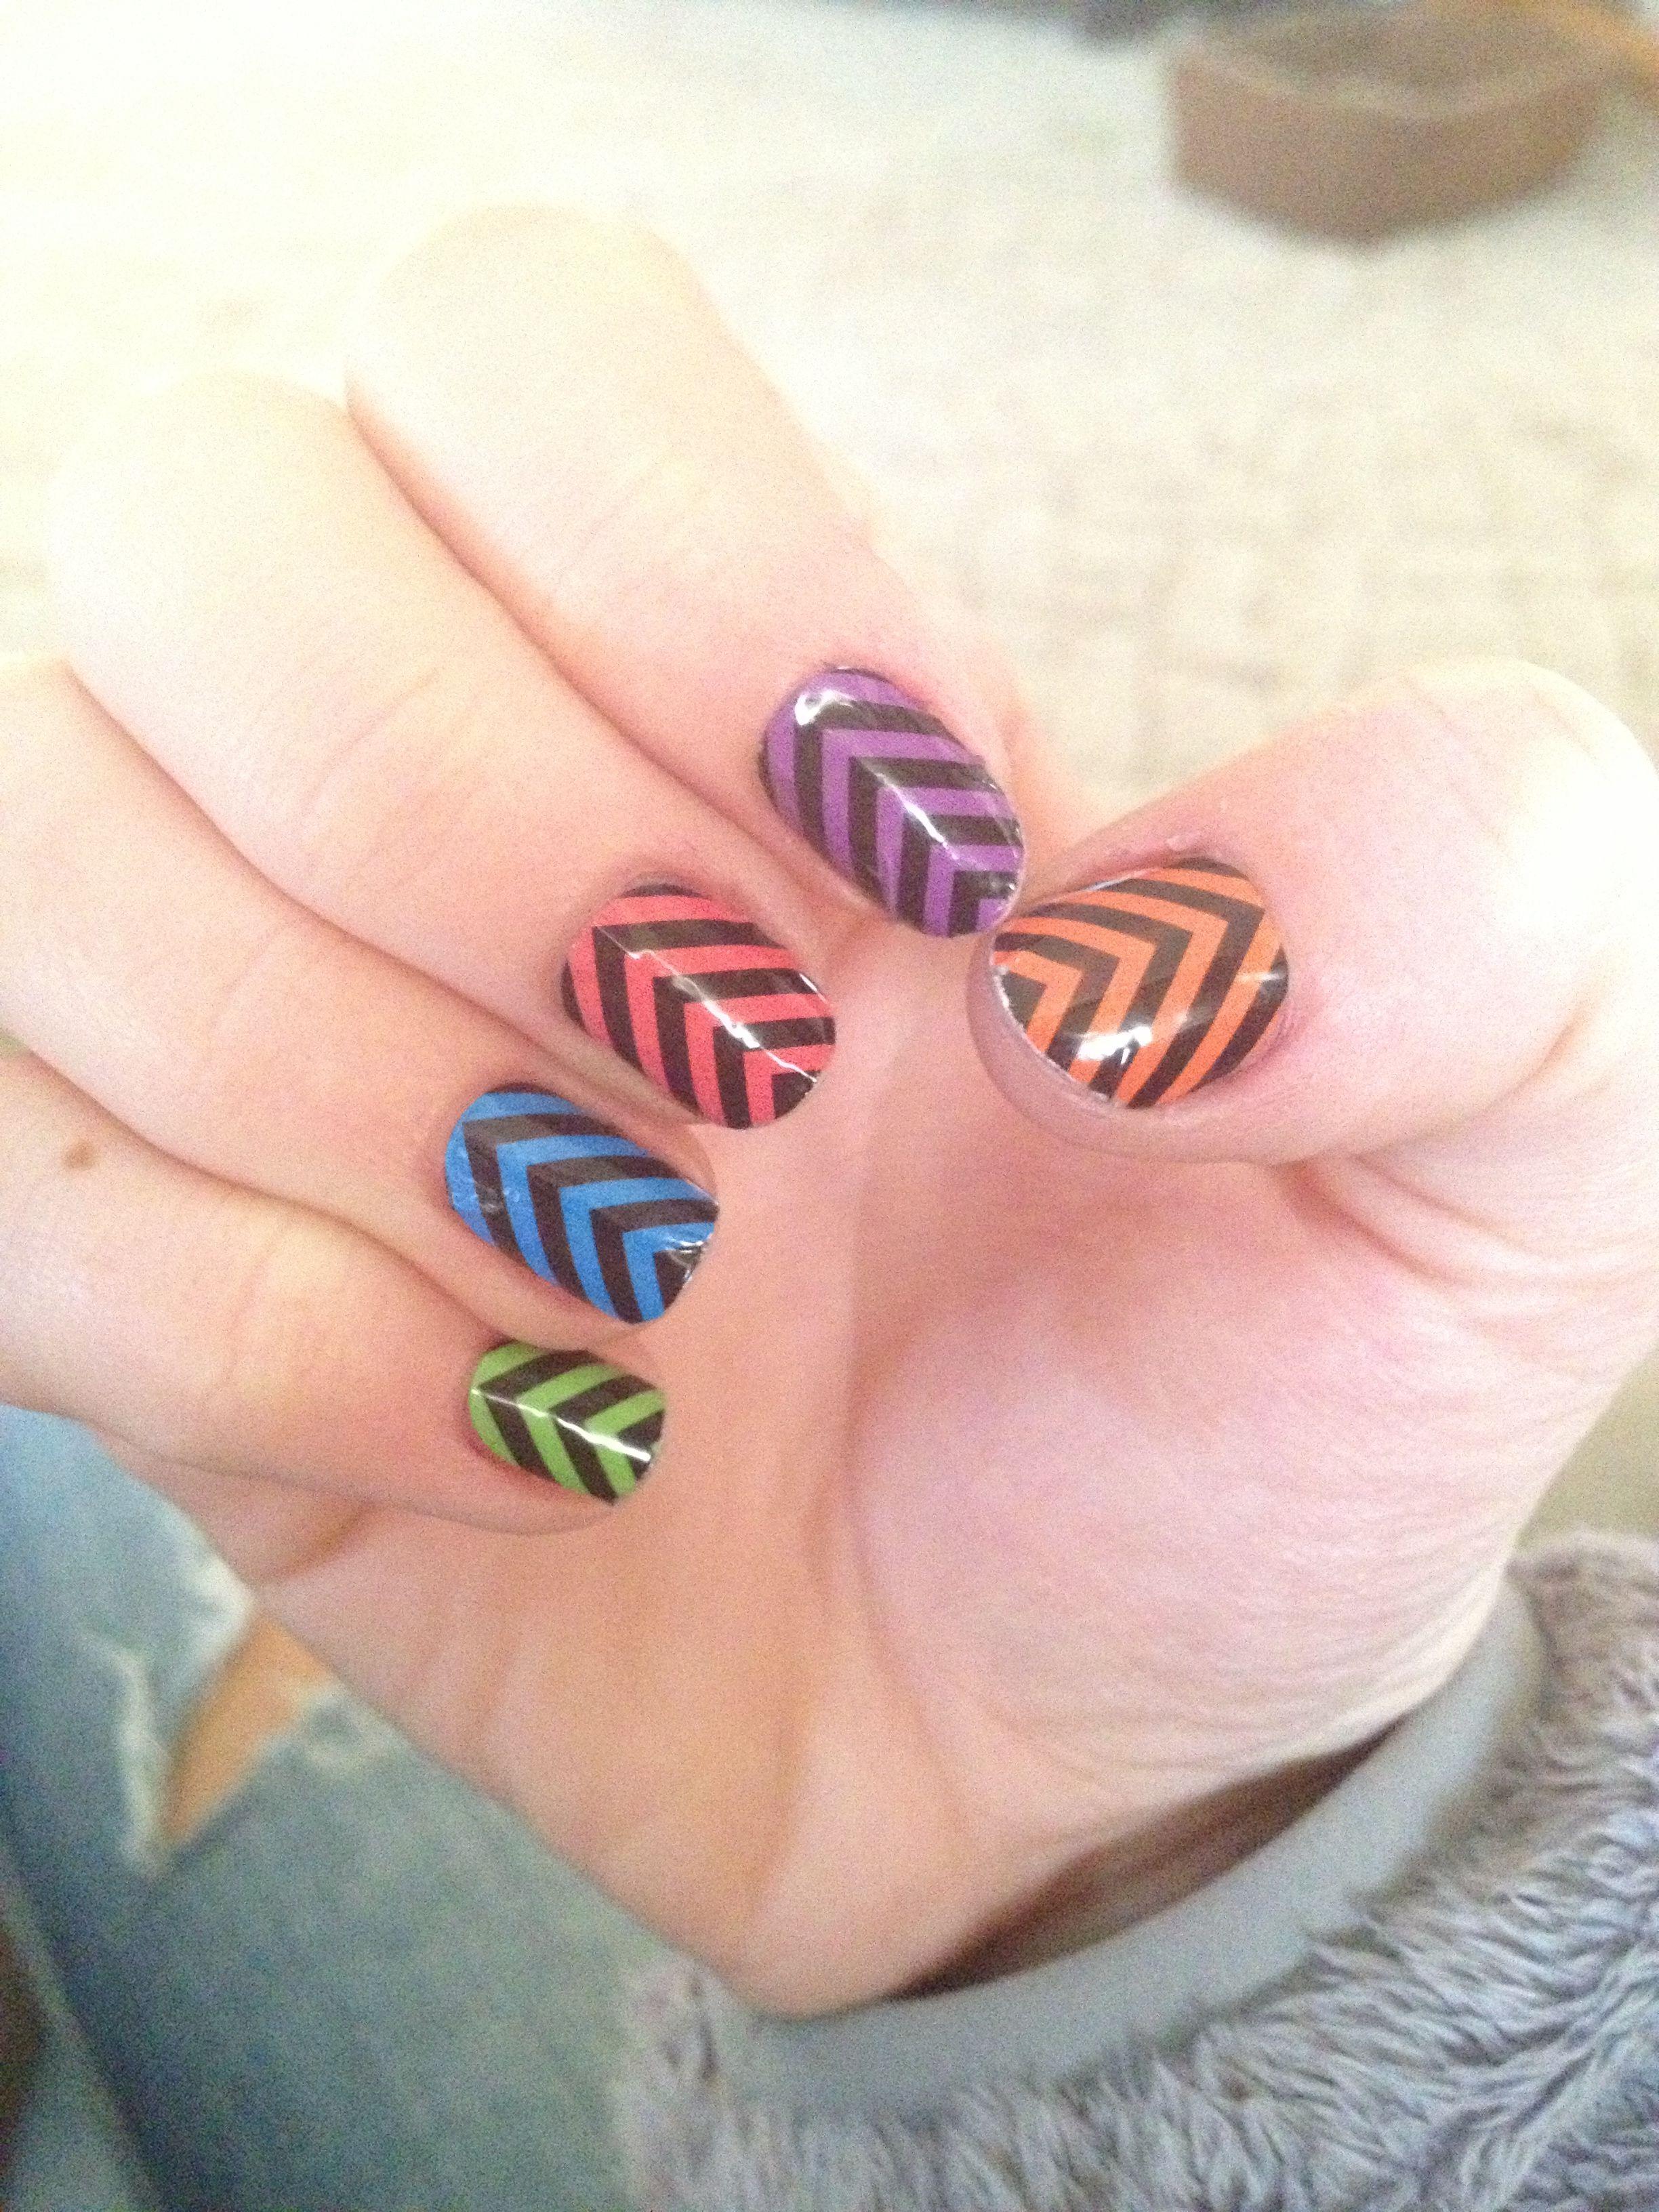 Chevron nails | Nails | Pinterest | Chevron nail art, Fun nails and ...